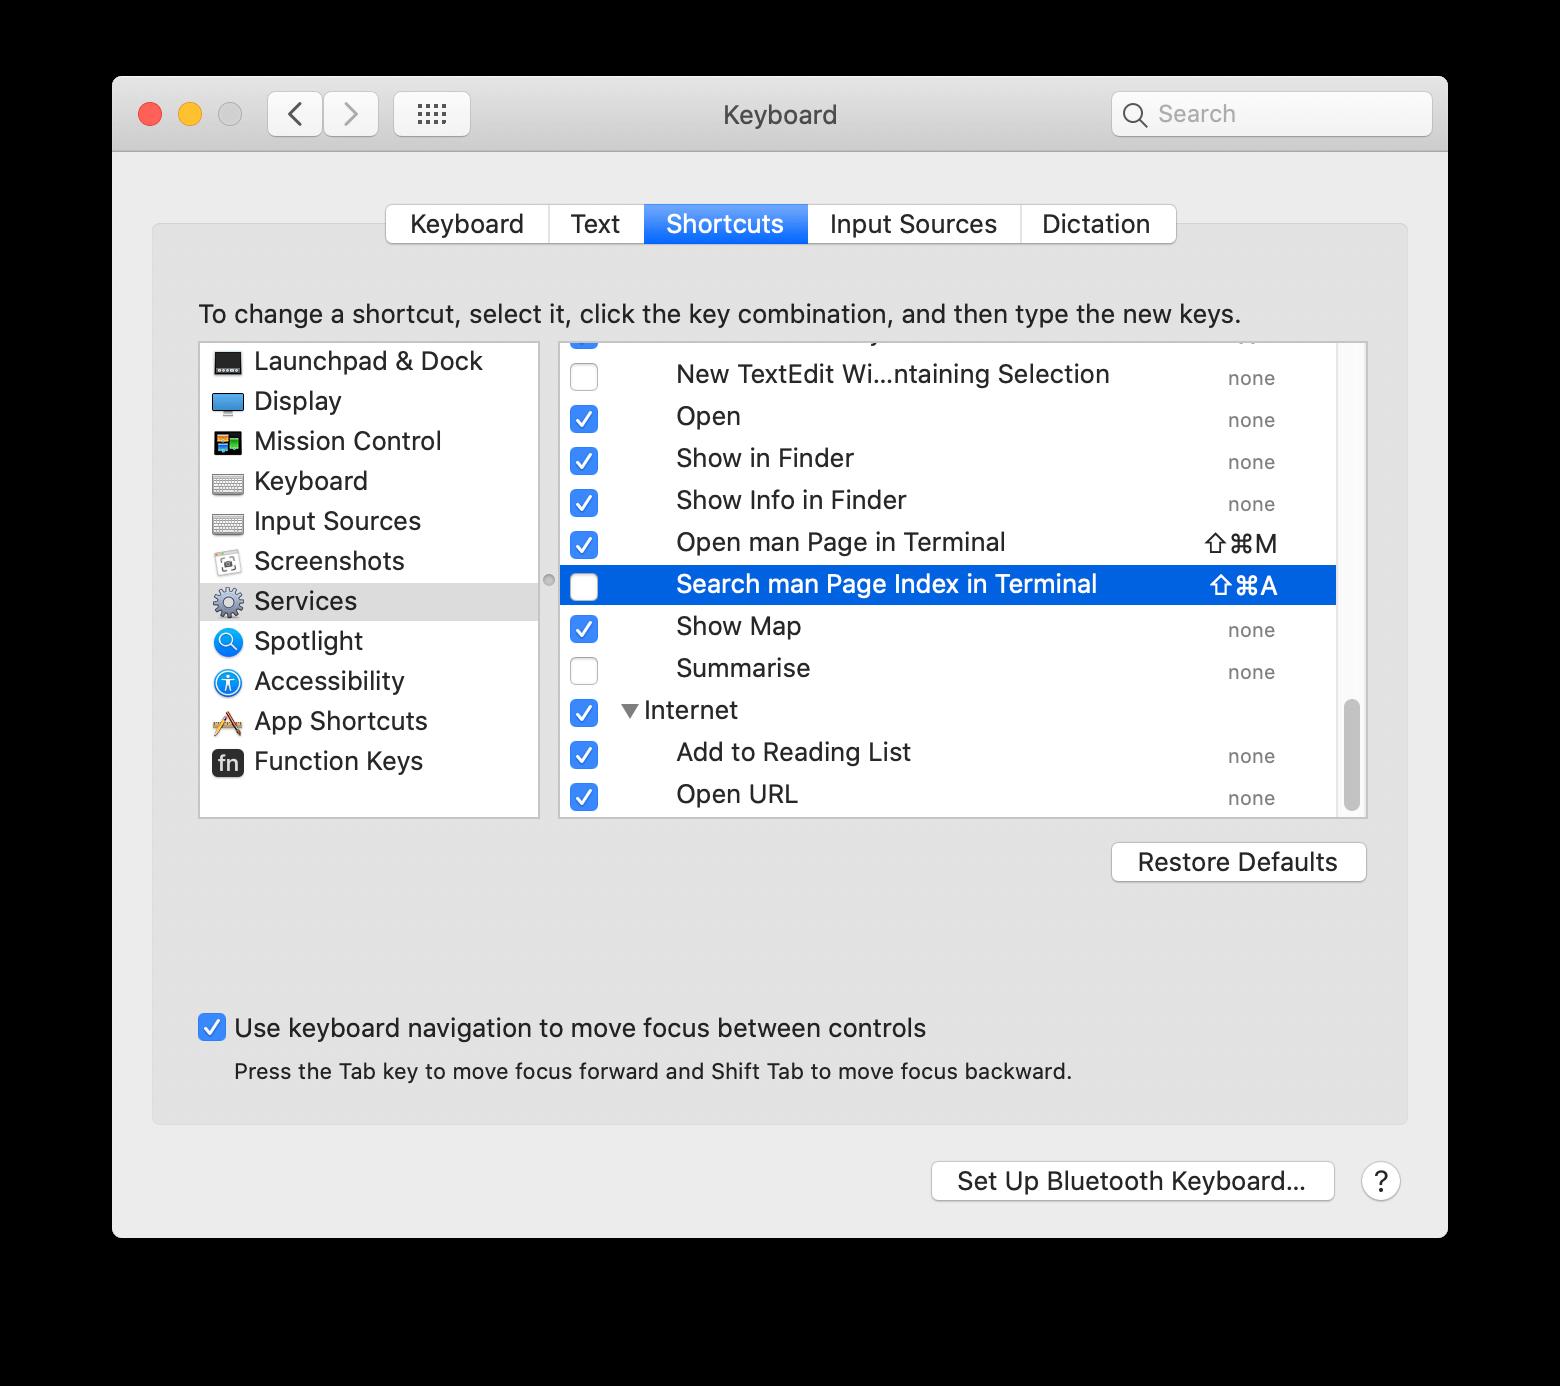 Disable Keyboard Shortcut